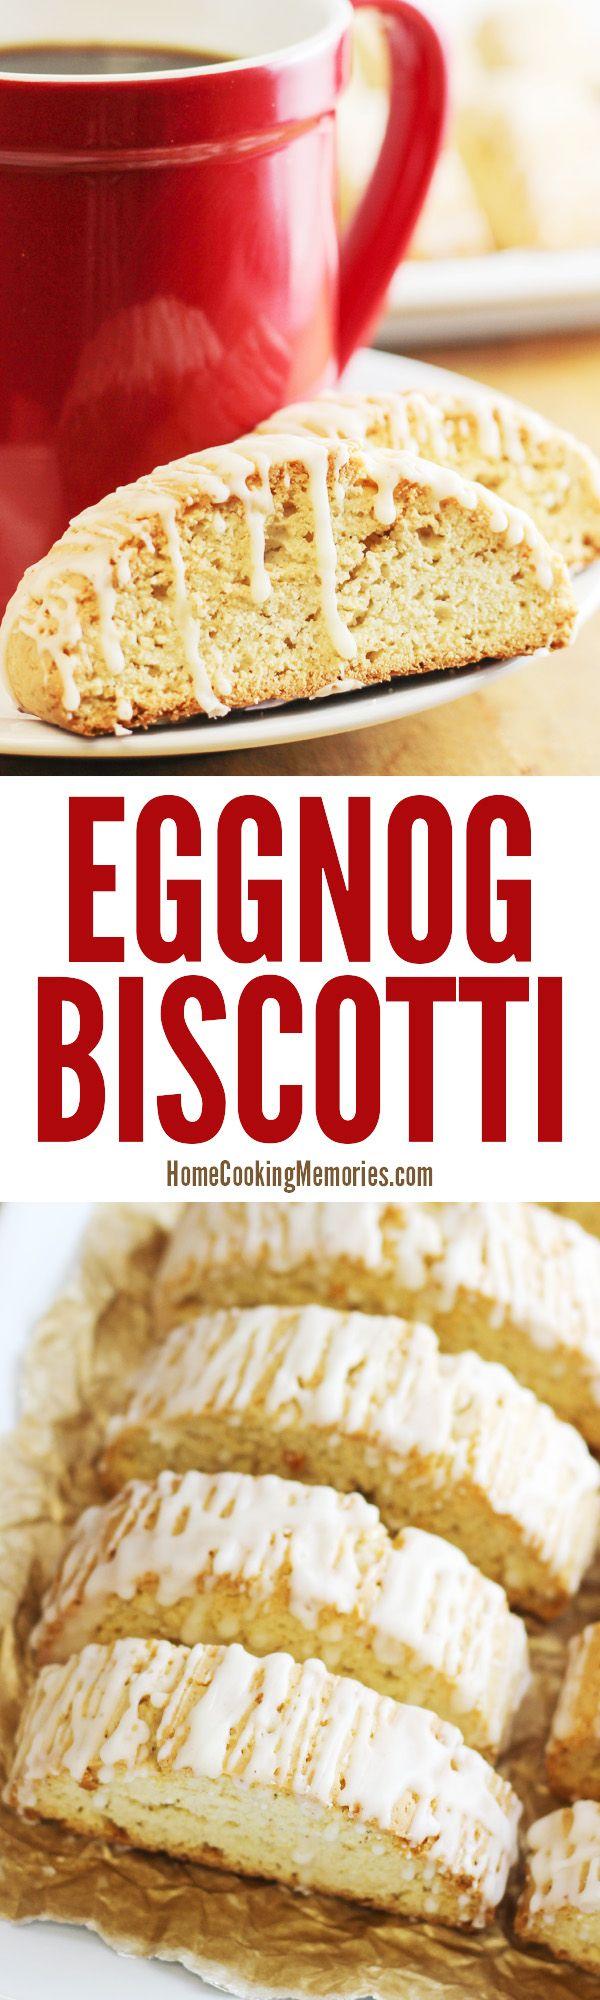 Eggnog Biscotti Recipe Recipe Eggnog Biscotti Recipe Biscotti Recipe Recipes